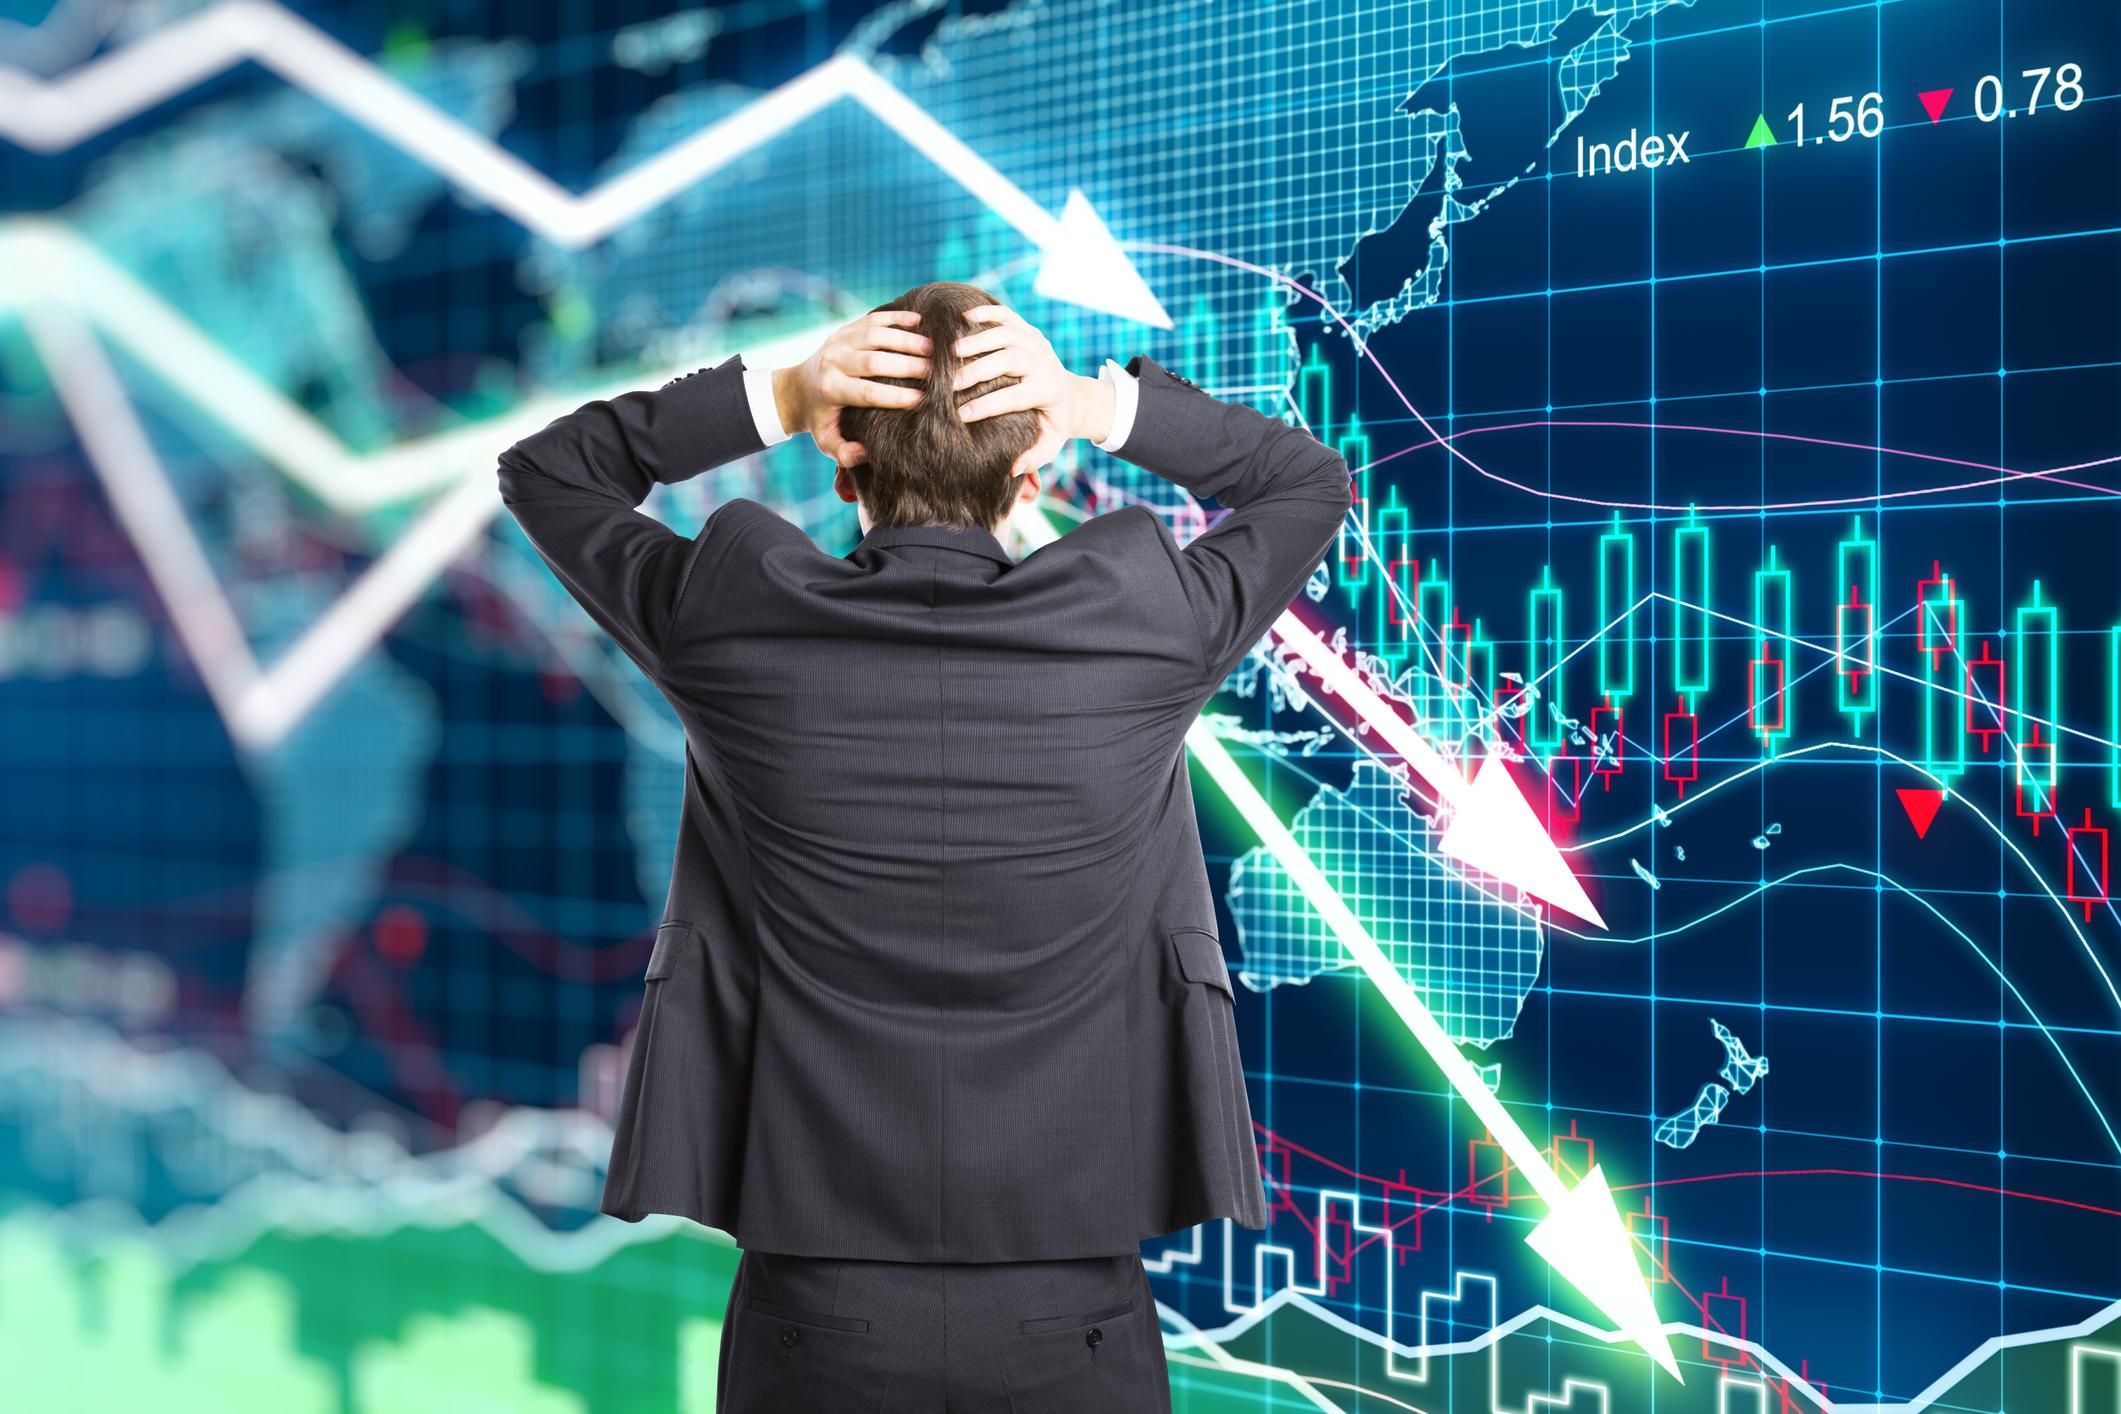 Digital representation of a crashing stock market